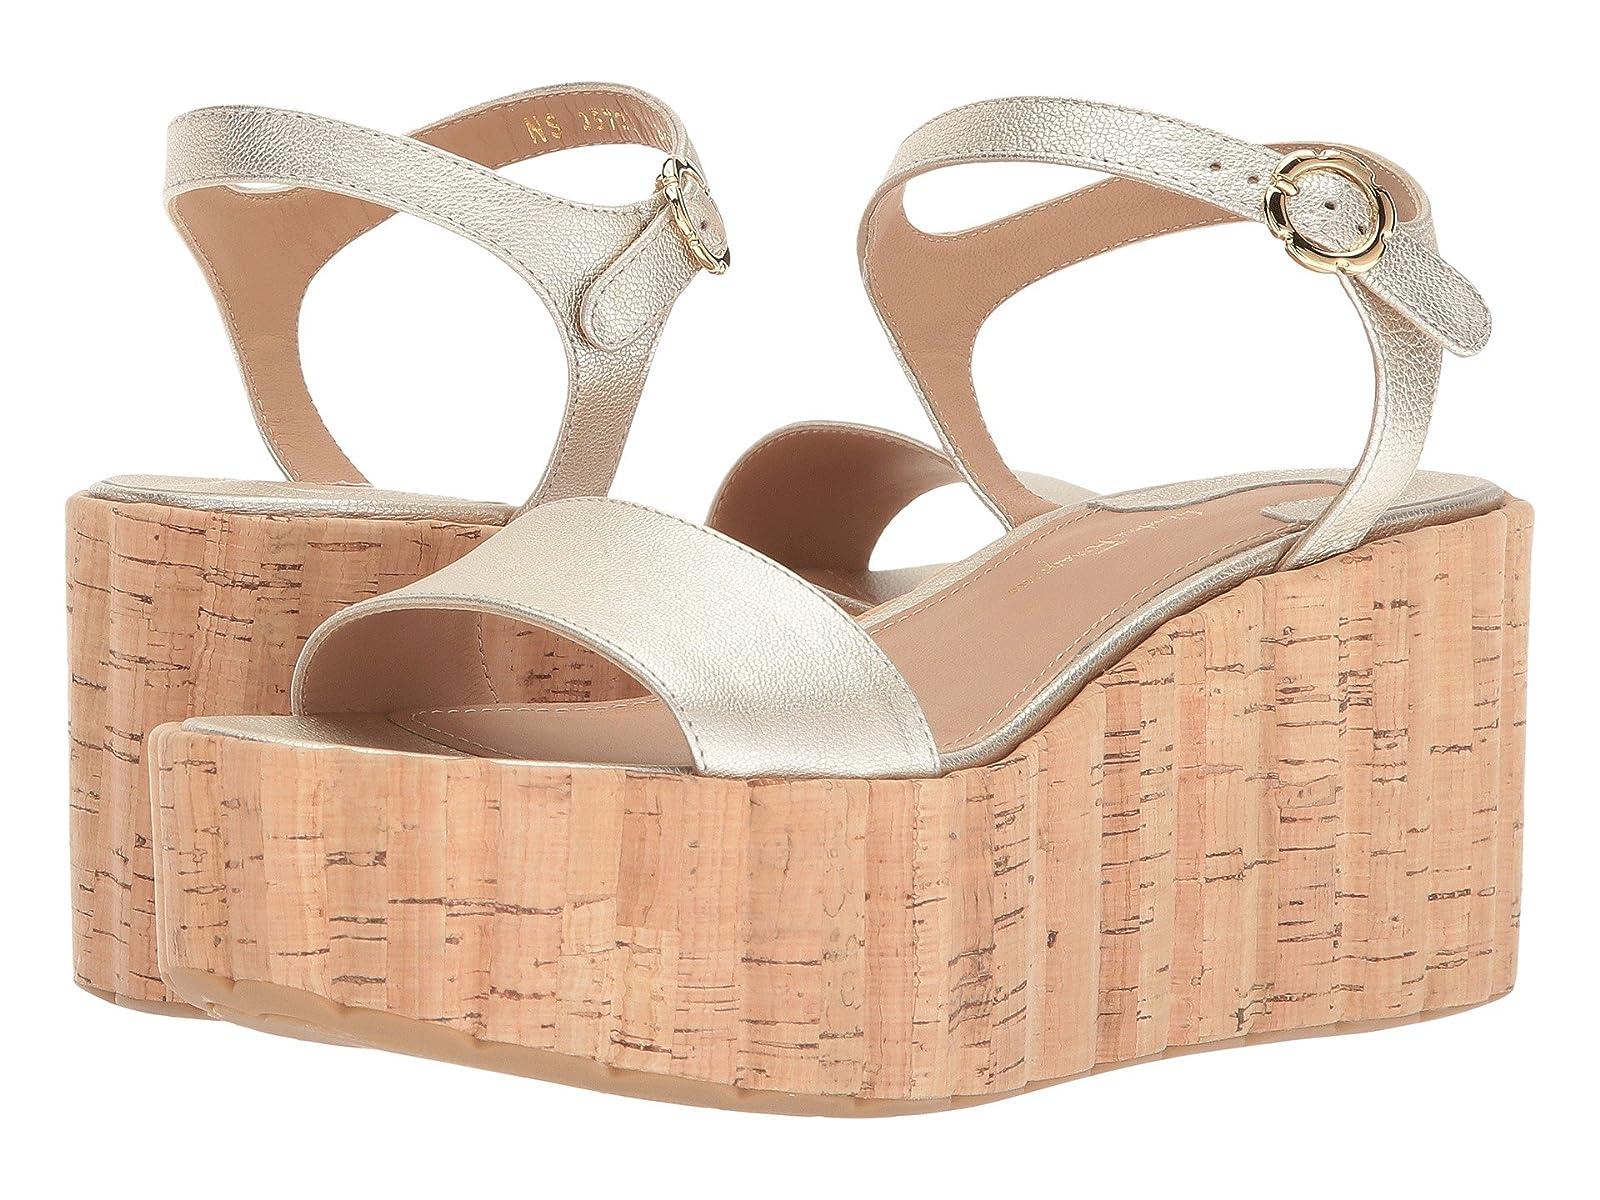 Salvatore Ferragamo TropeaCheap and distinctive eye-catching shoes